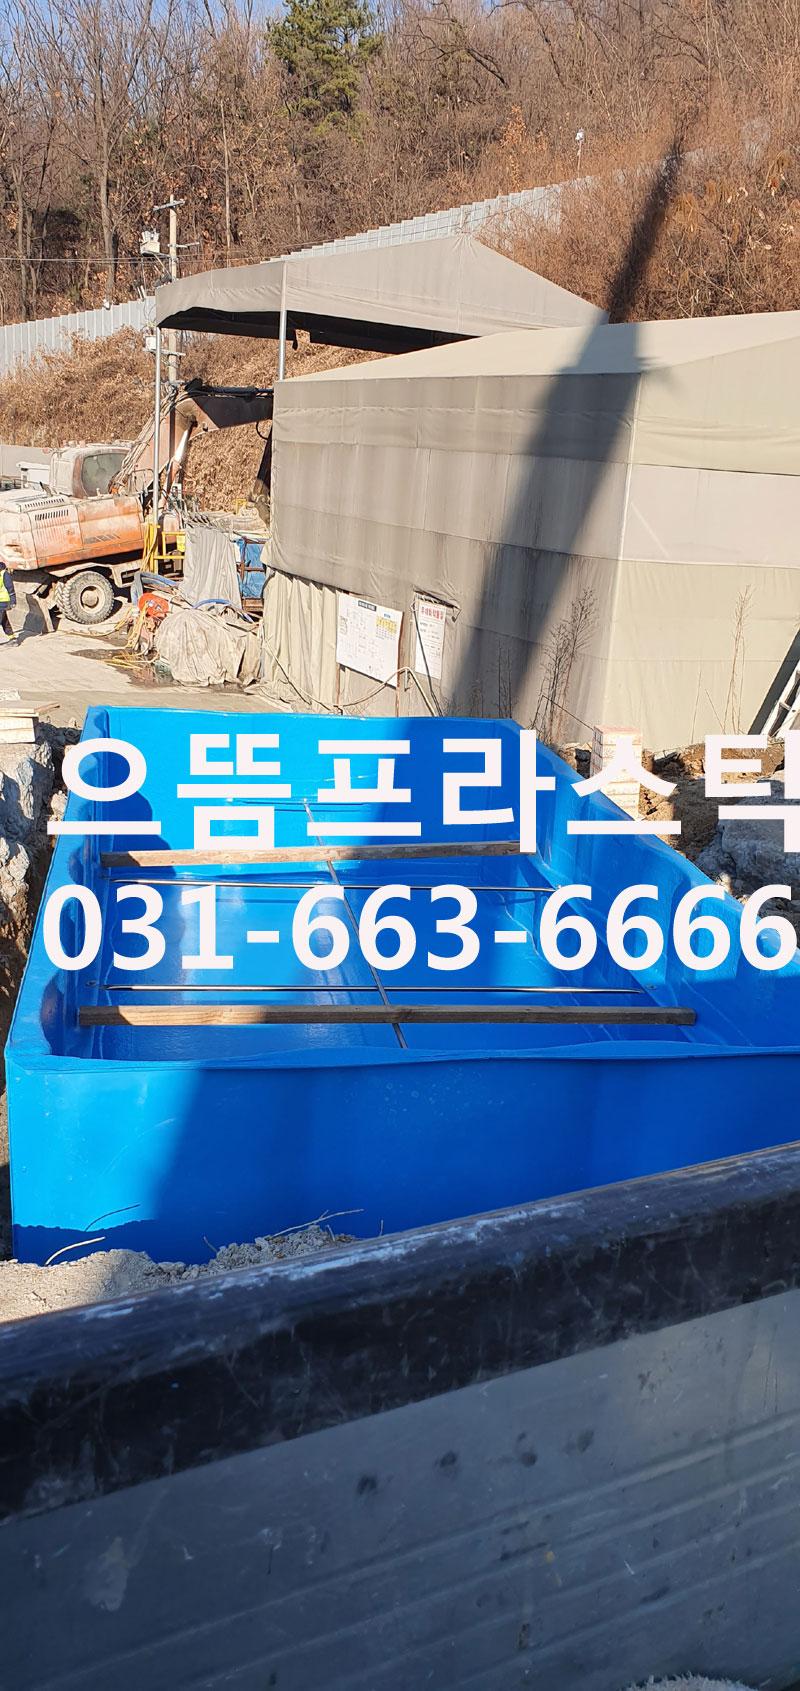 bc8a3508684248dcf64821a6d33ba2fe_1613715716_982.jpg